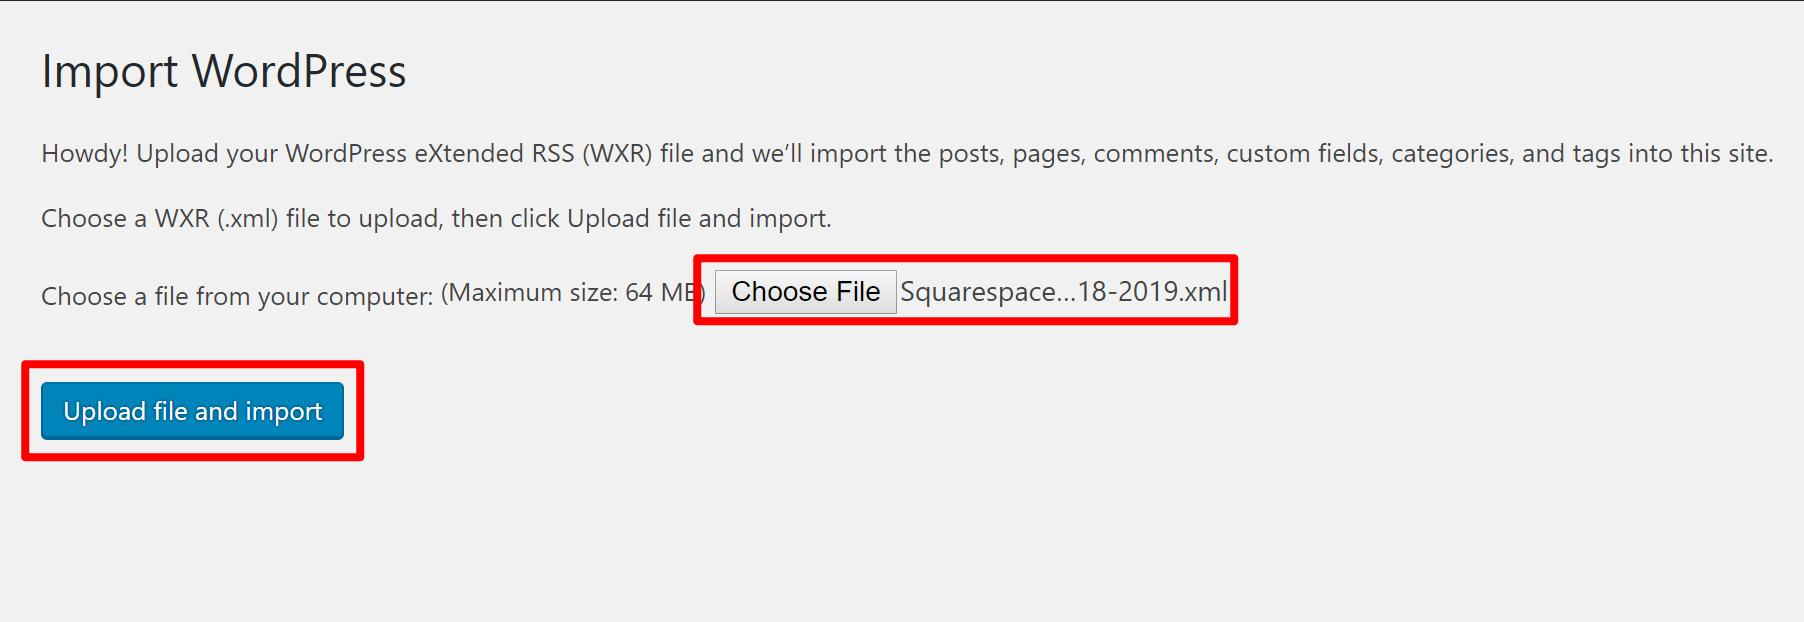 Choose Squarespace export file for WordPress